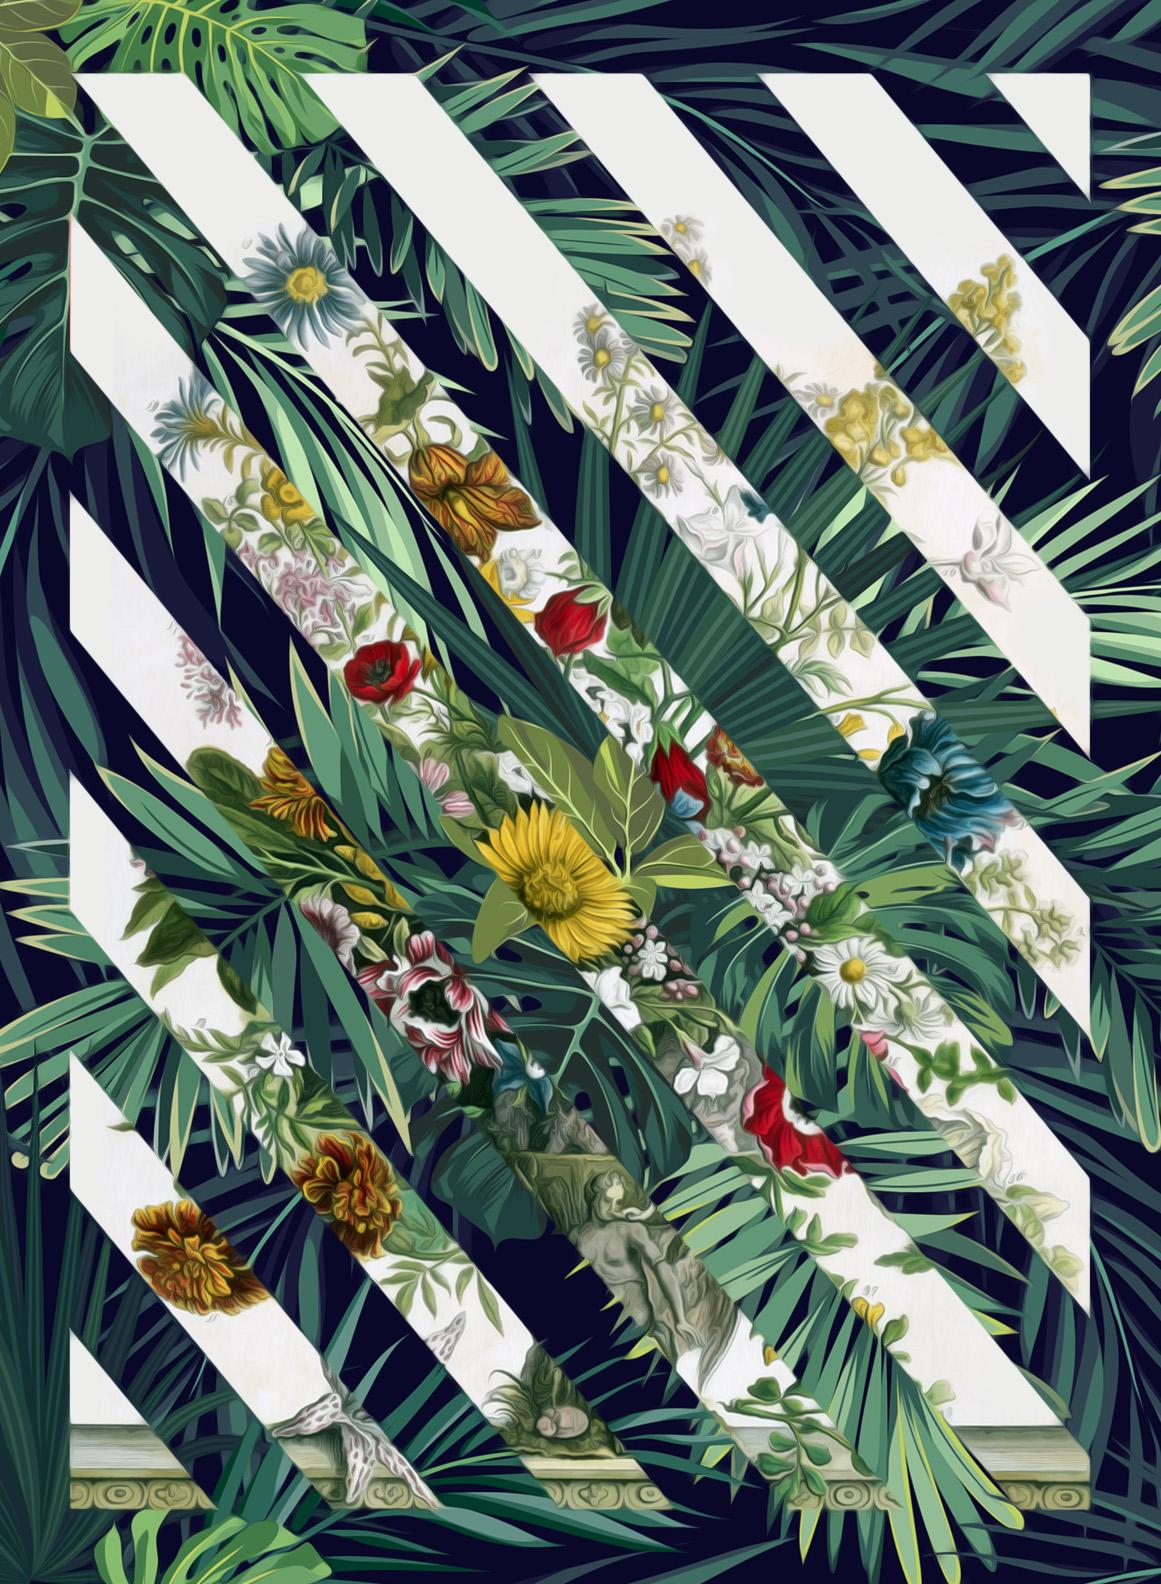 Plants Untitled 1 by Dan Alva